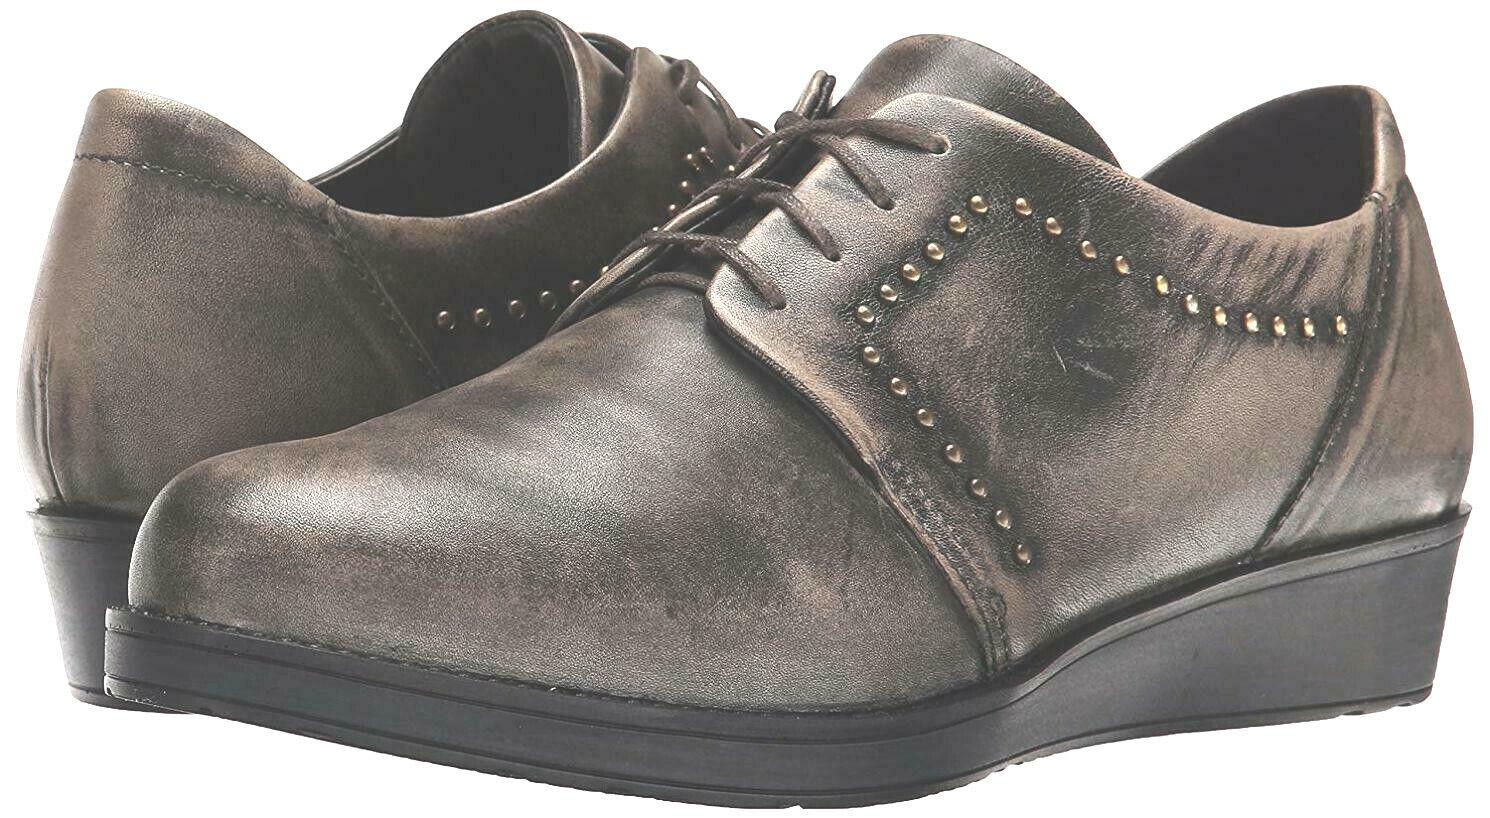 Naot Embrace Flat Vintage Grey Leather, Size 36 36 36 EUR   5.5 US f8d233